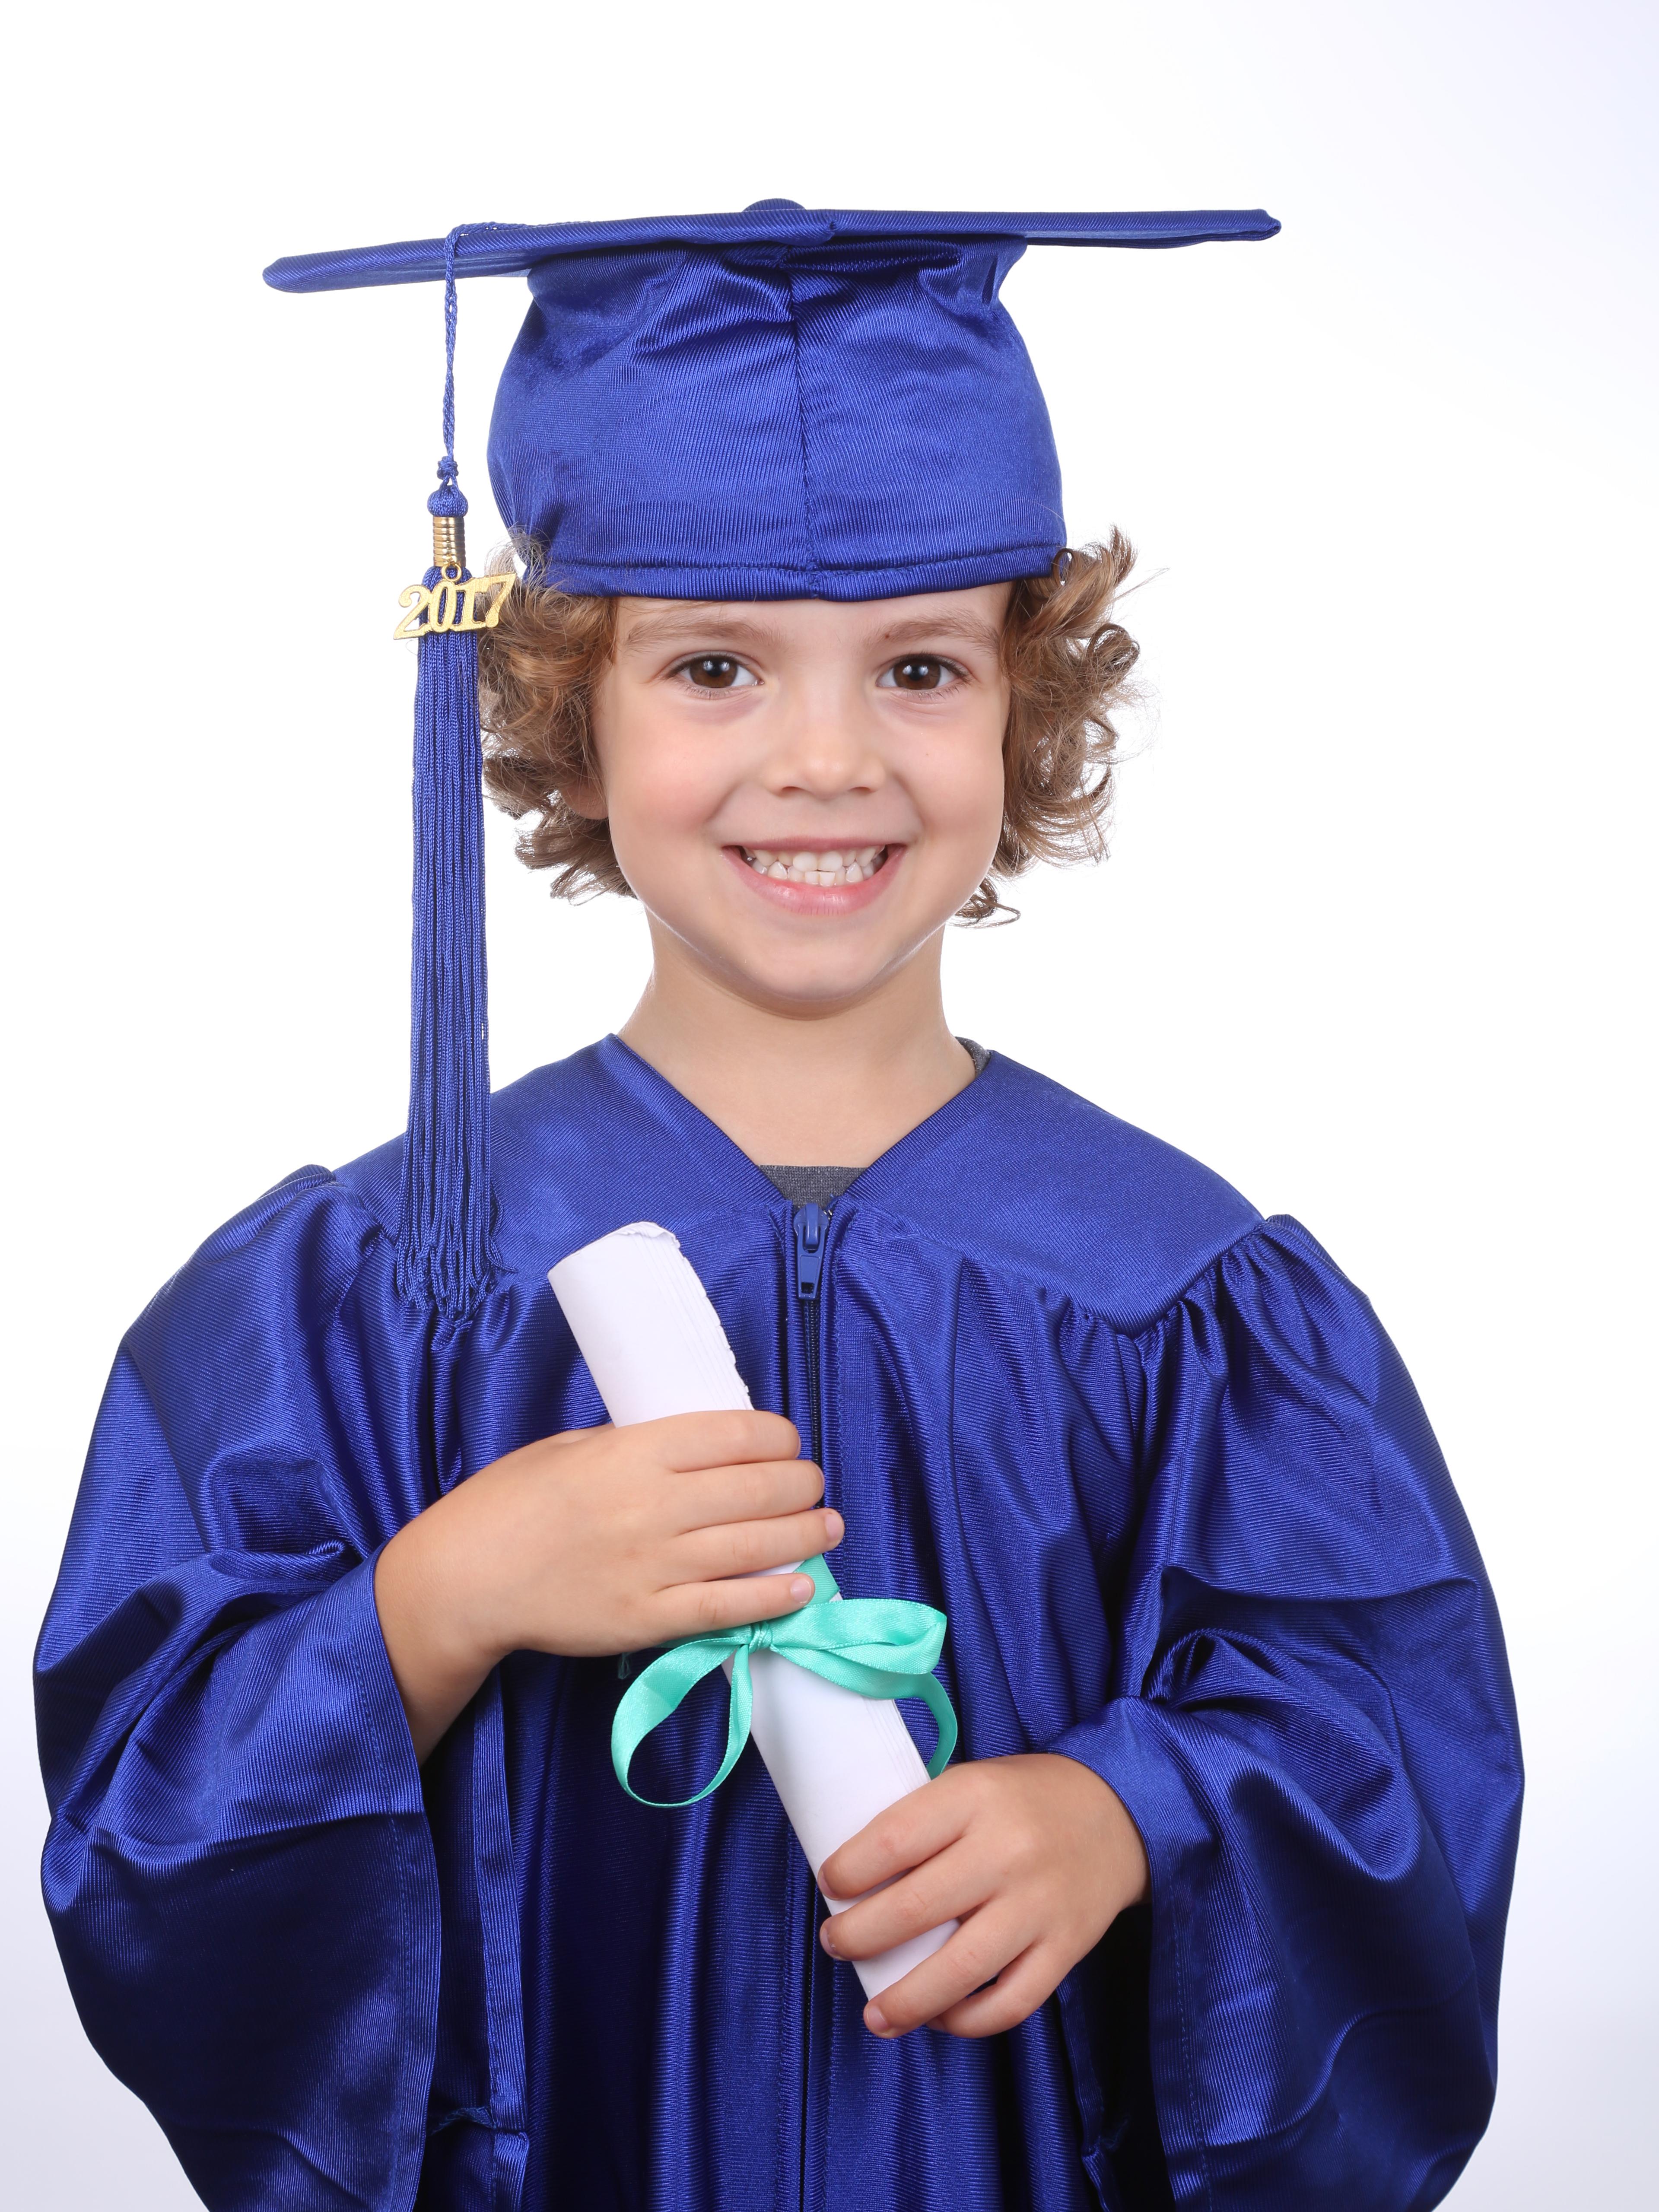 Going to Big School, Blue, Boy, Children, Dress, HQ Photo